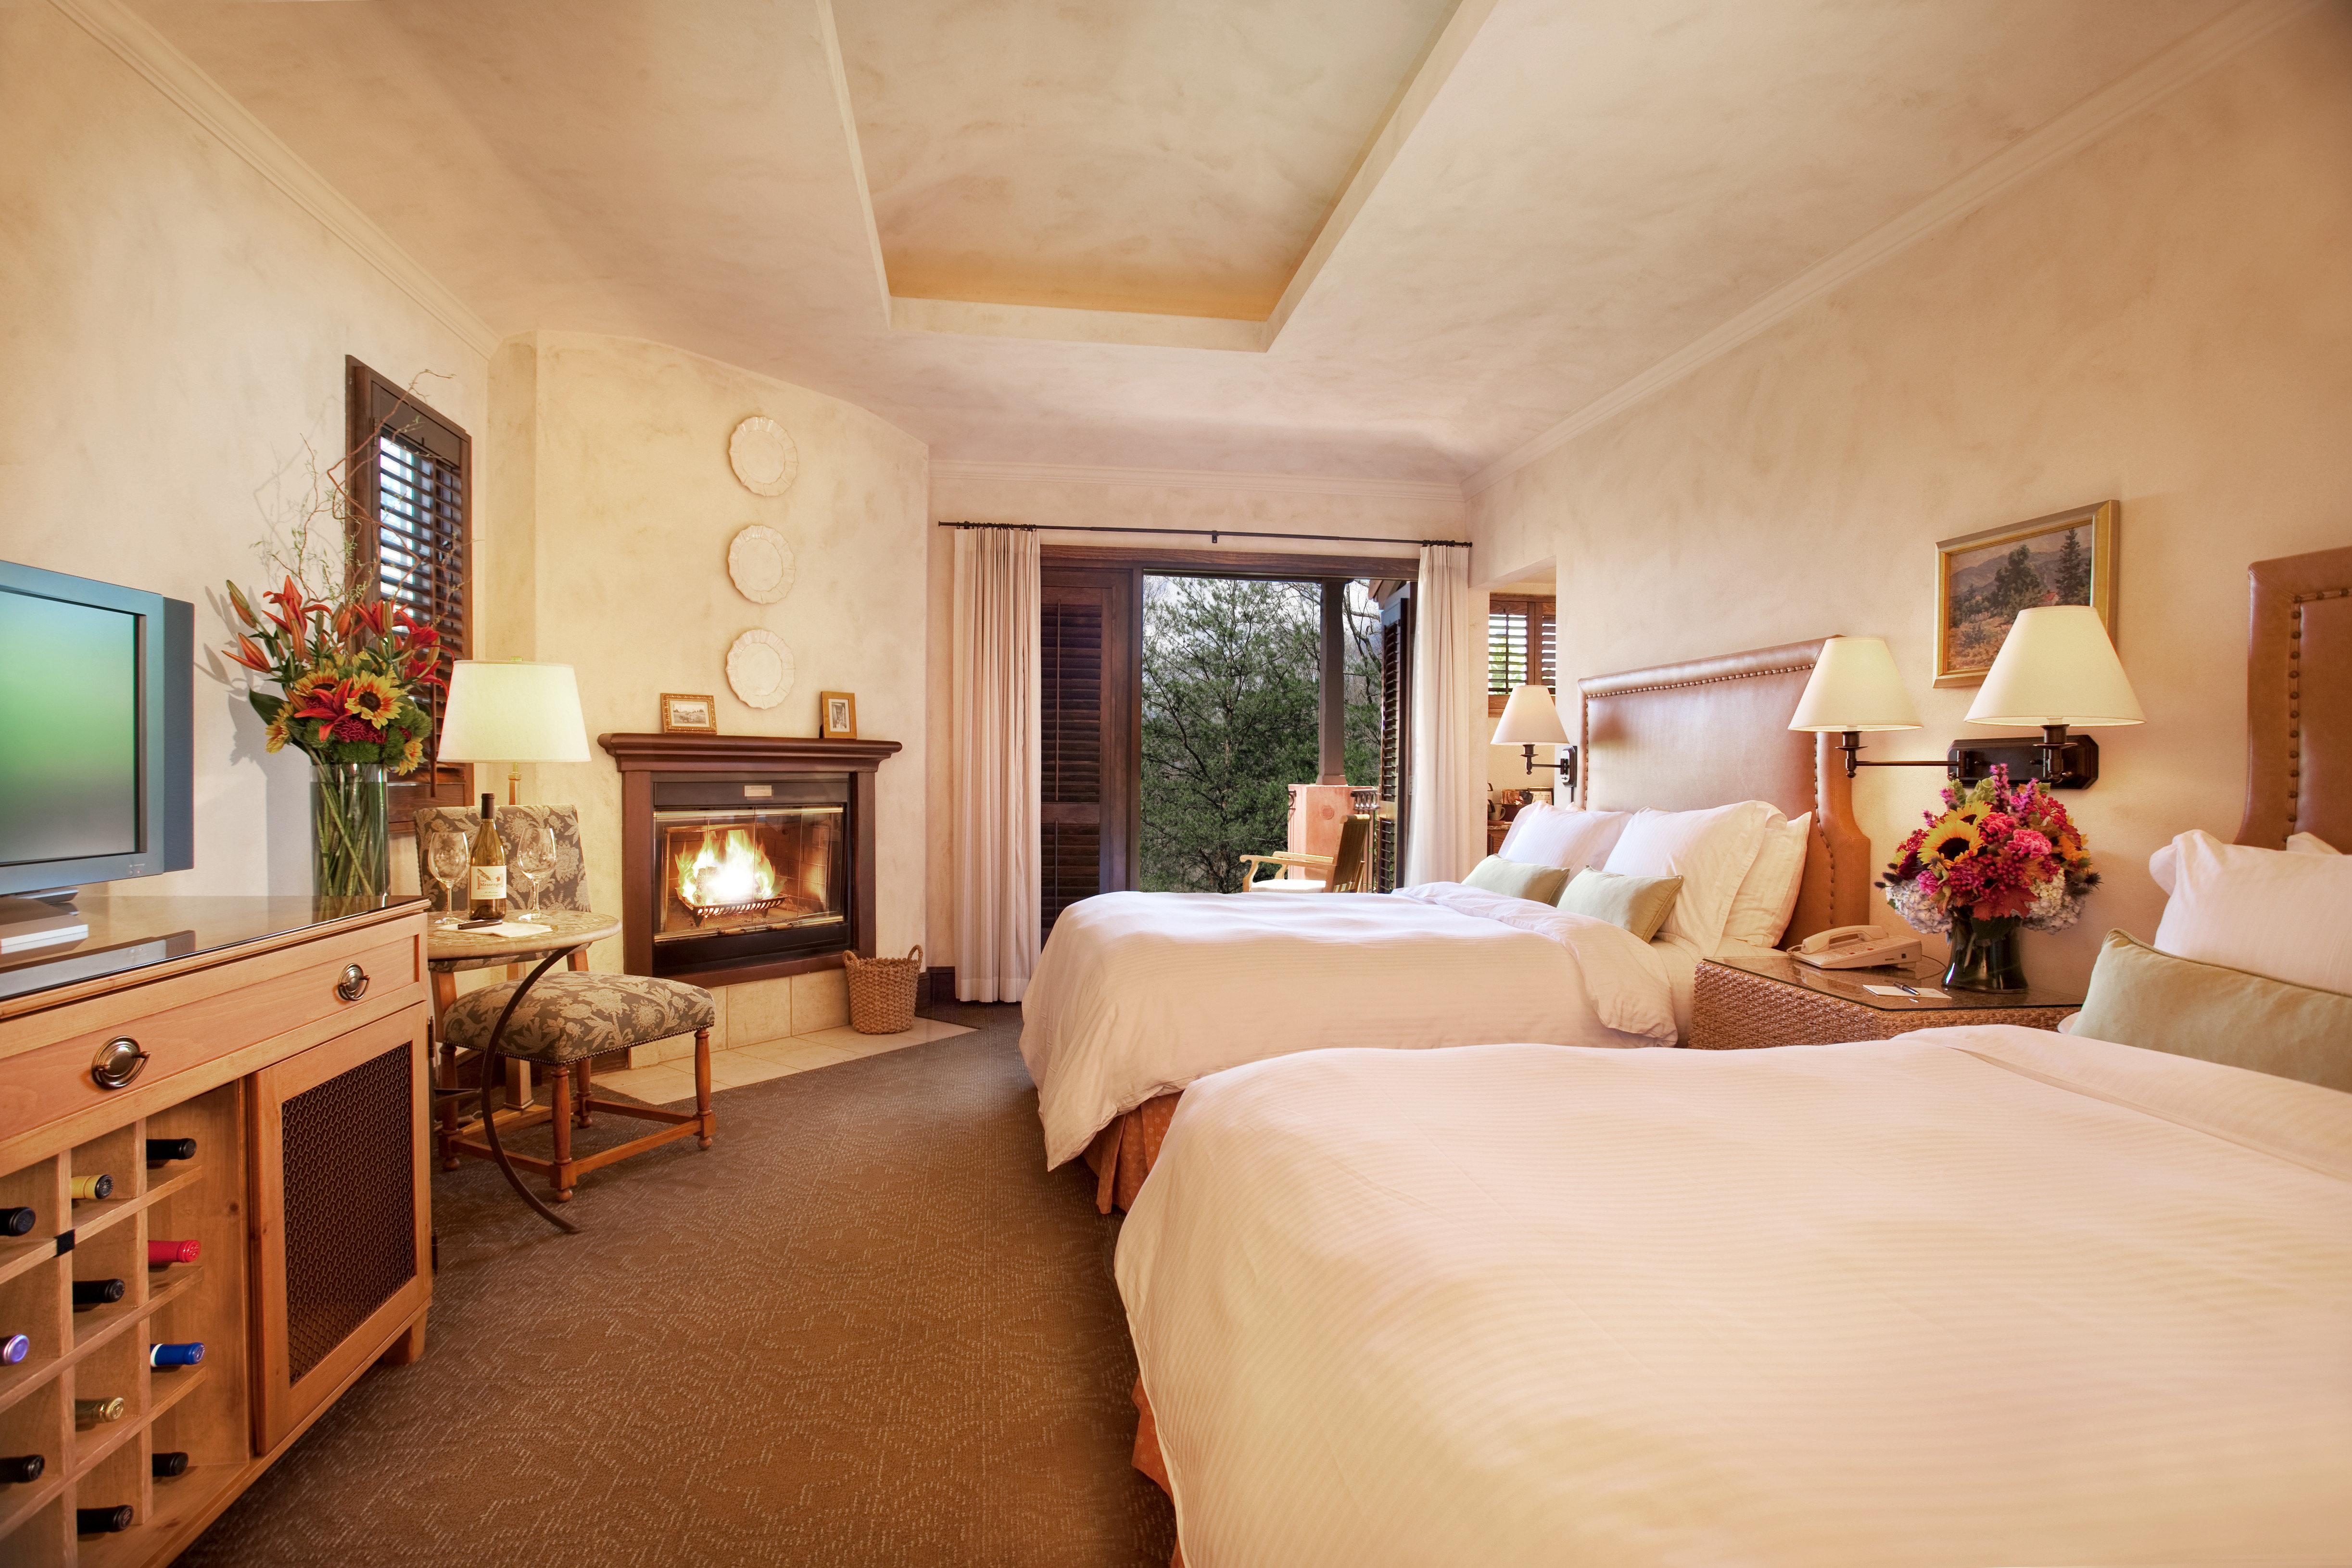 Bedroom Elegant Luxury Modern Suite property home house living room cottage Villa farmhouse mansion